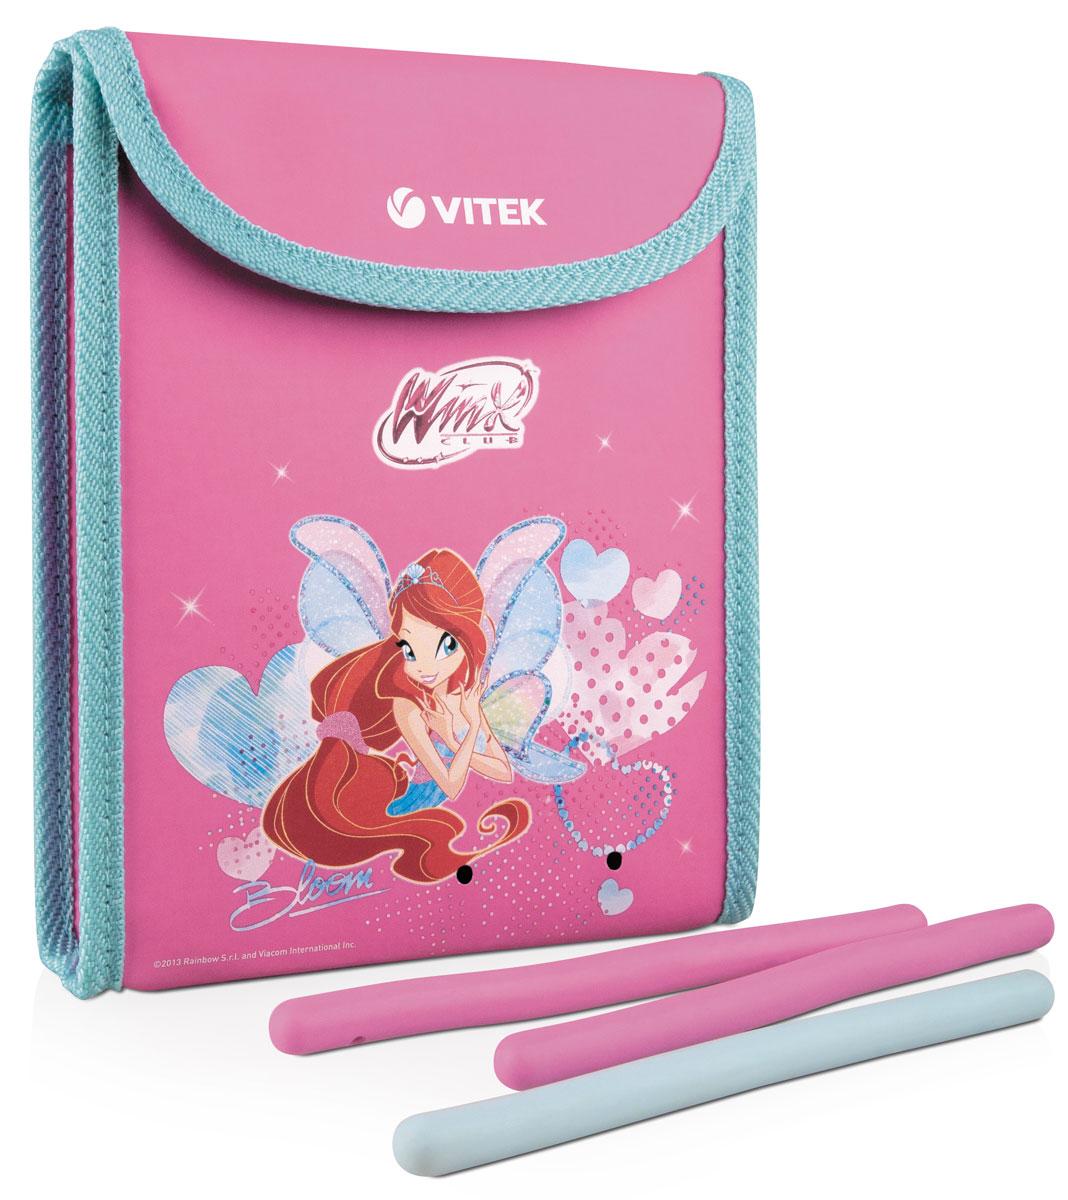 Vitek Winx 2052 Bloom набор для укладки волос